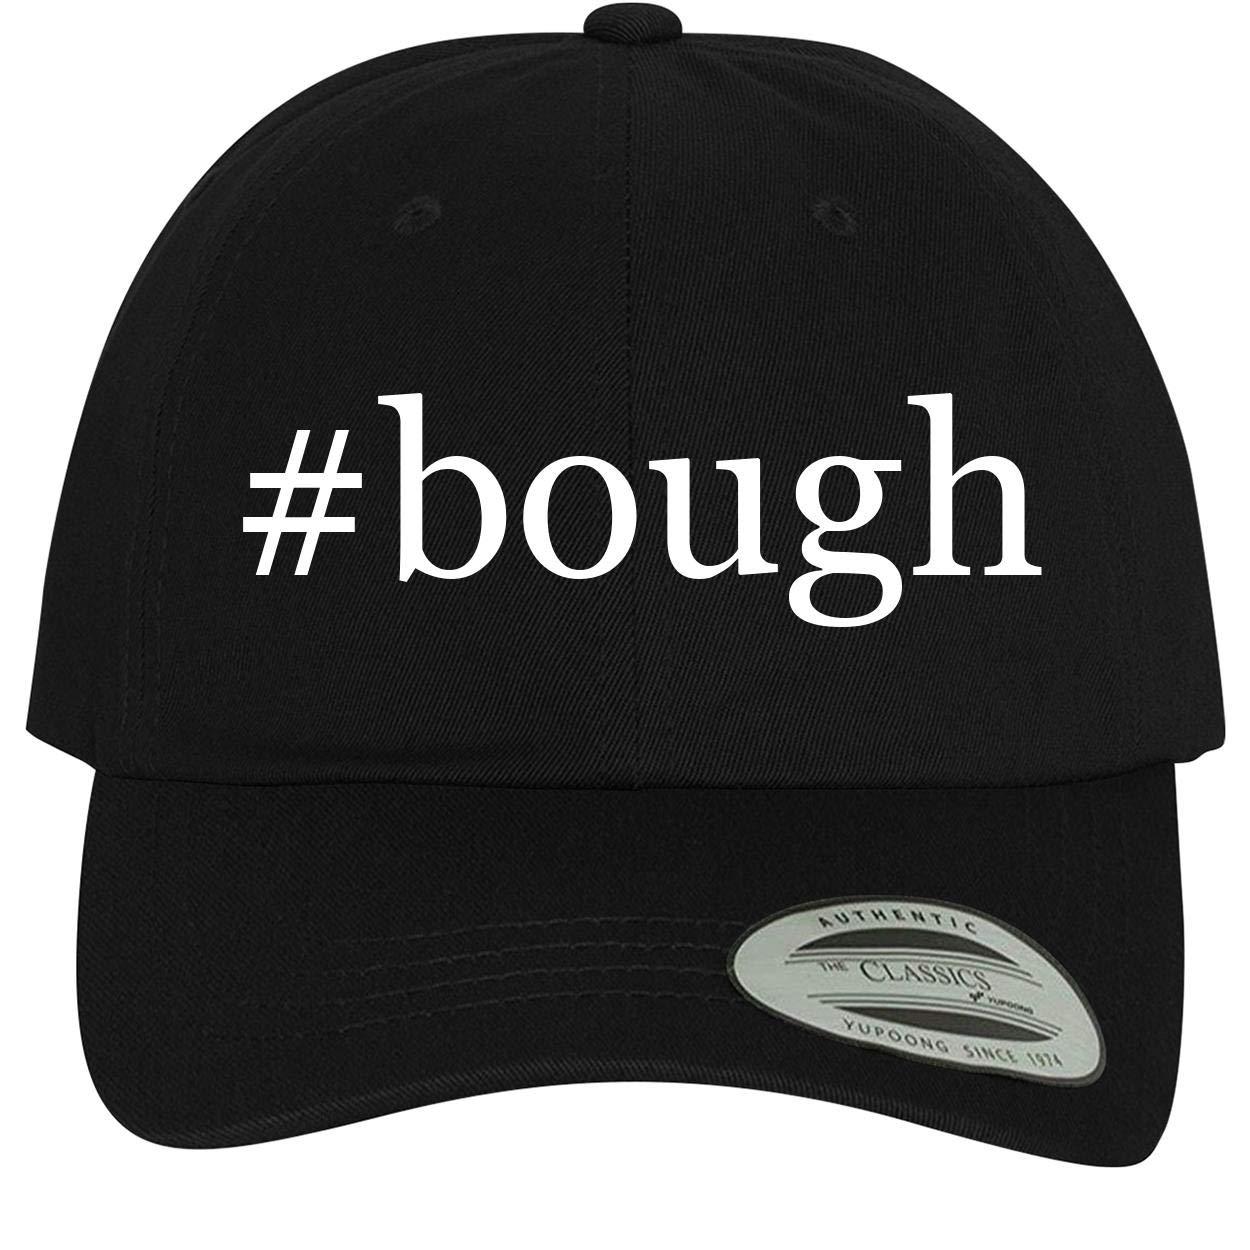 BH Cool Designs #Bough Comfortable Dad Hat Baseball Cap